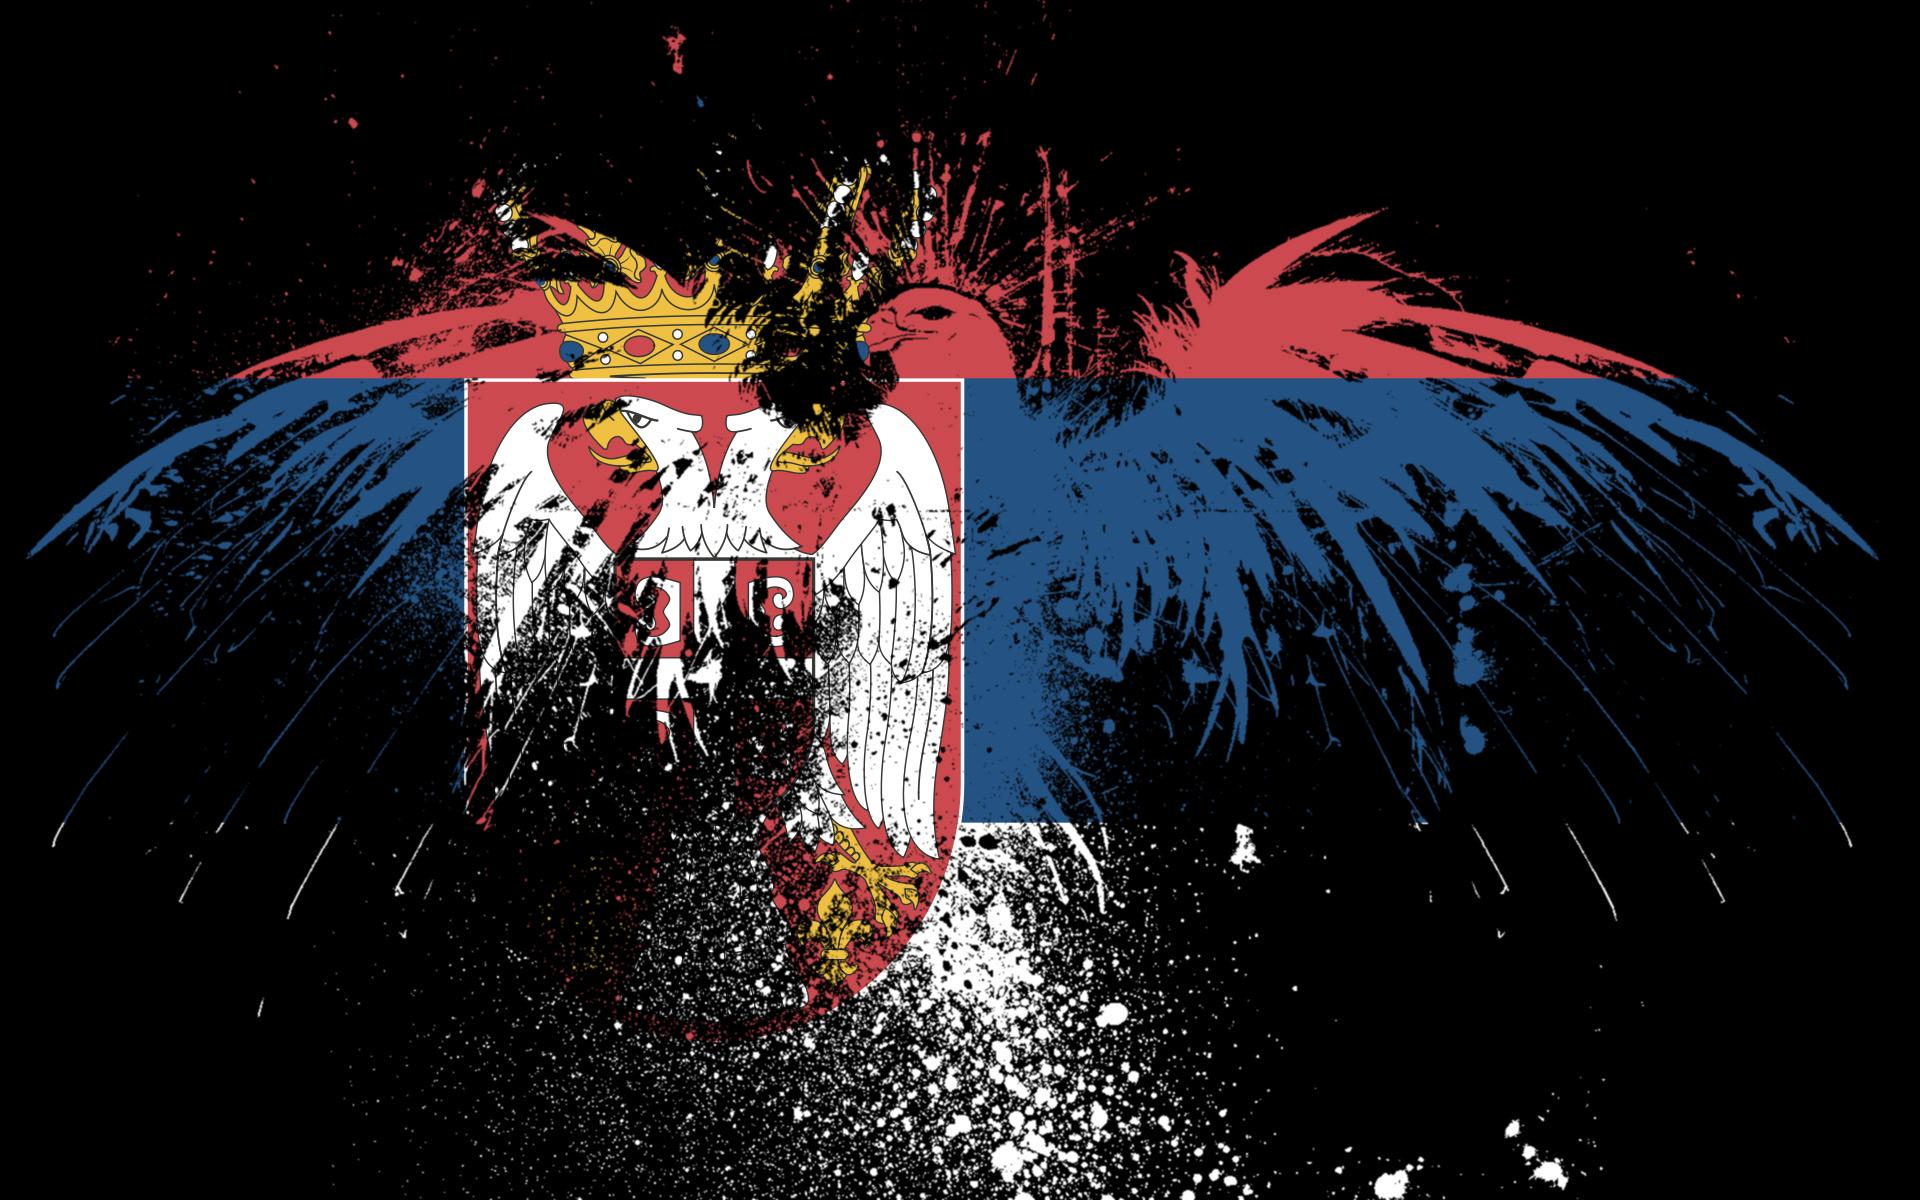 Wallpaper serbia serbia srbia flag the flag of serbia serbian 1920x1200